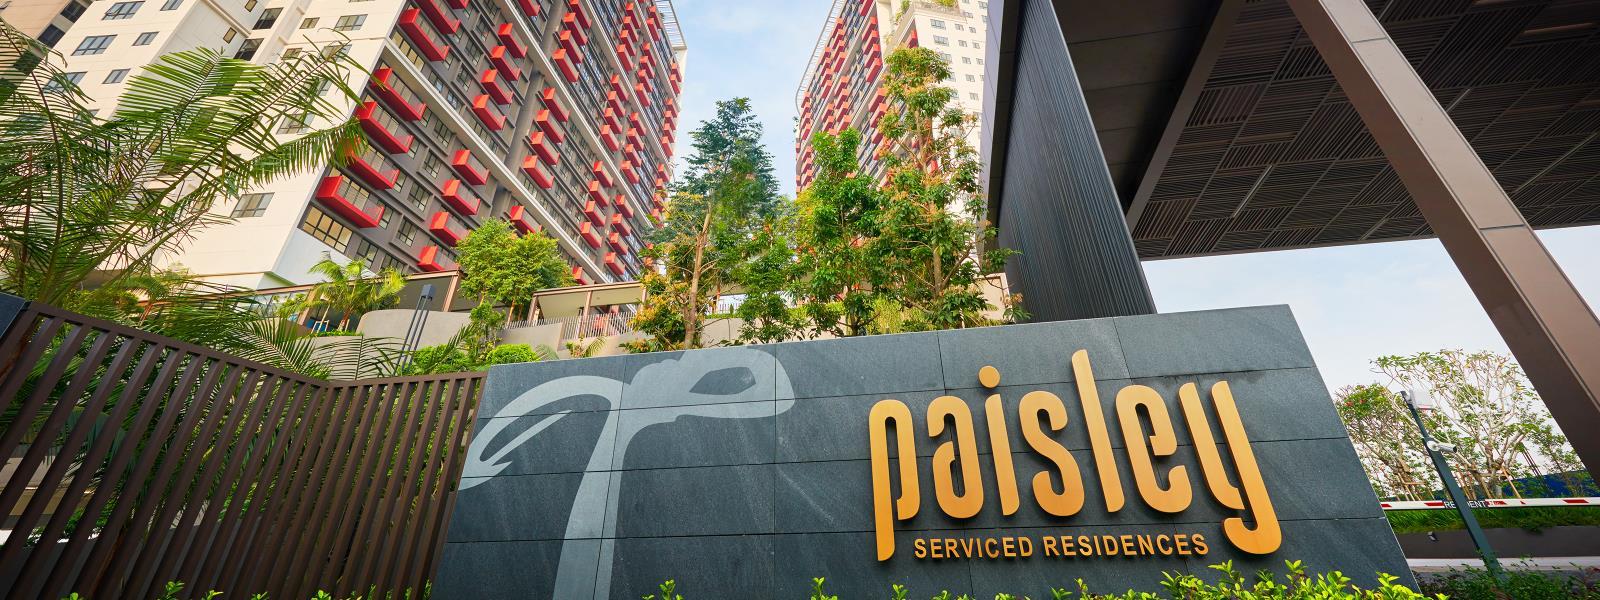 Paisley Serviced Residences, Tropicana Metropark